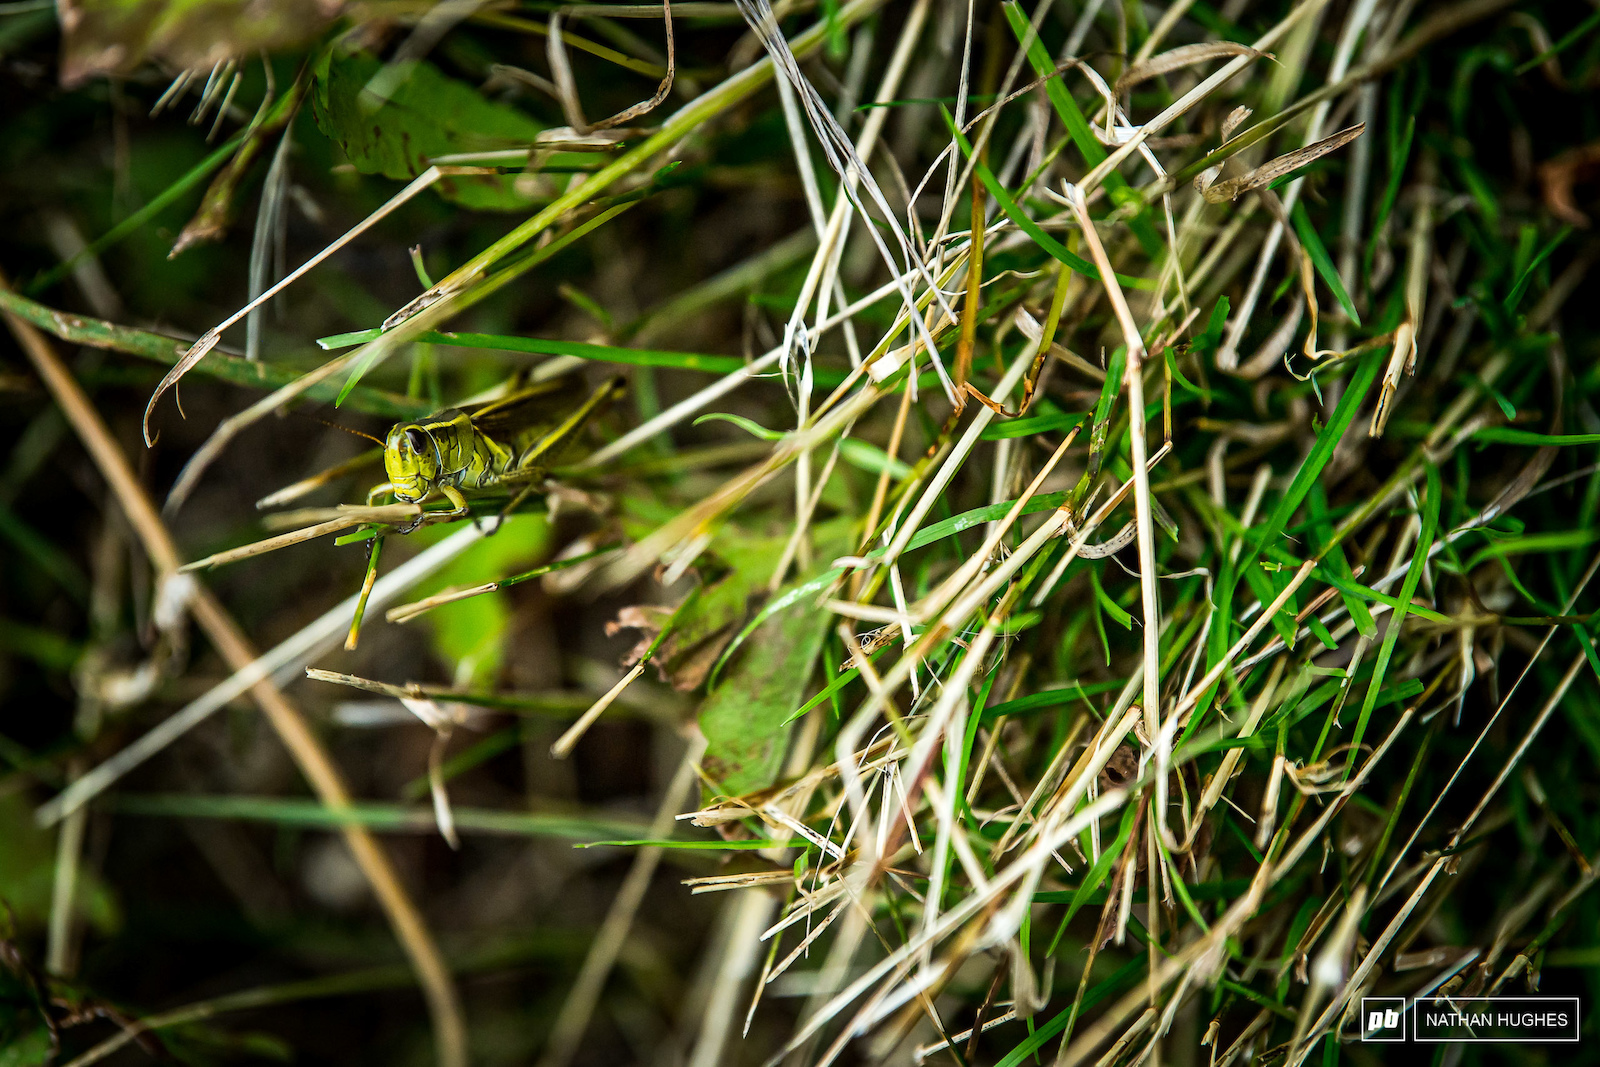 Six legged friends of the long grass unlike the dreaded biting black flies